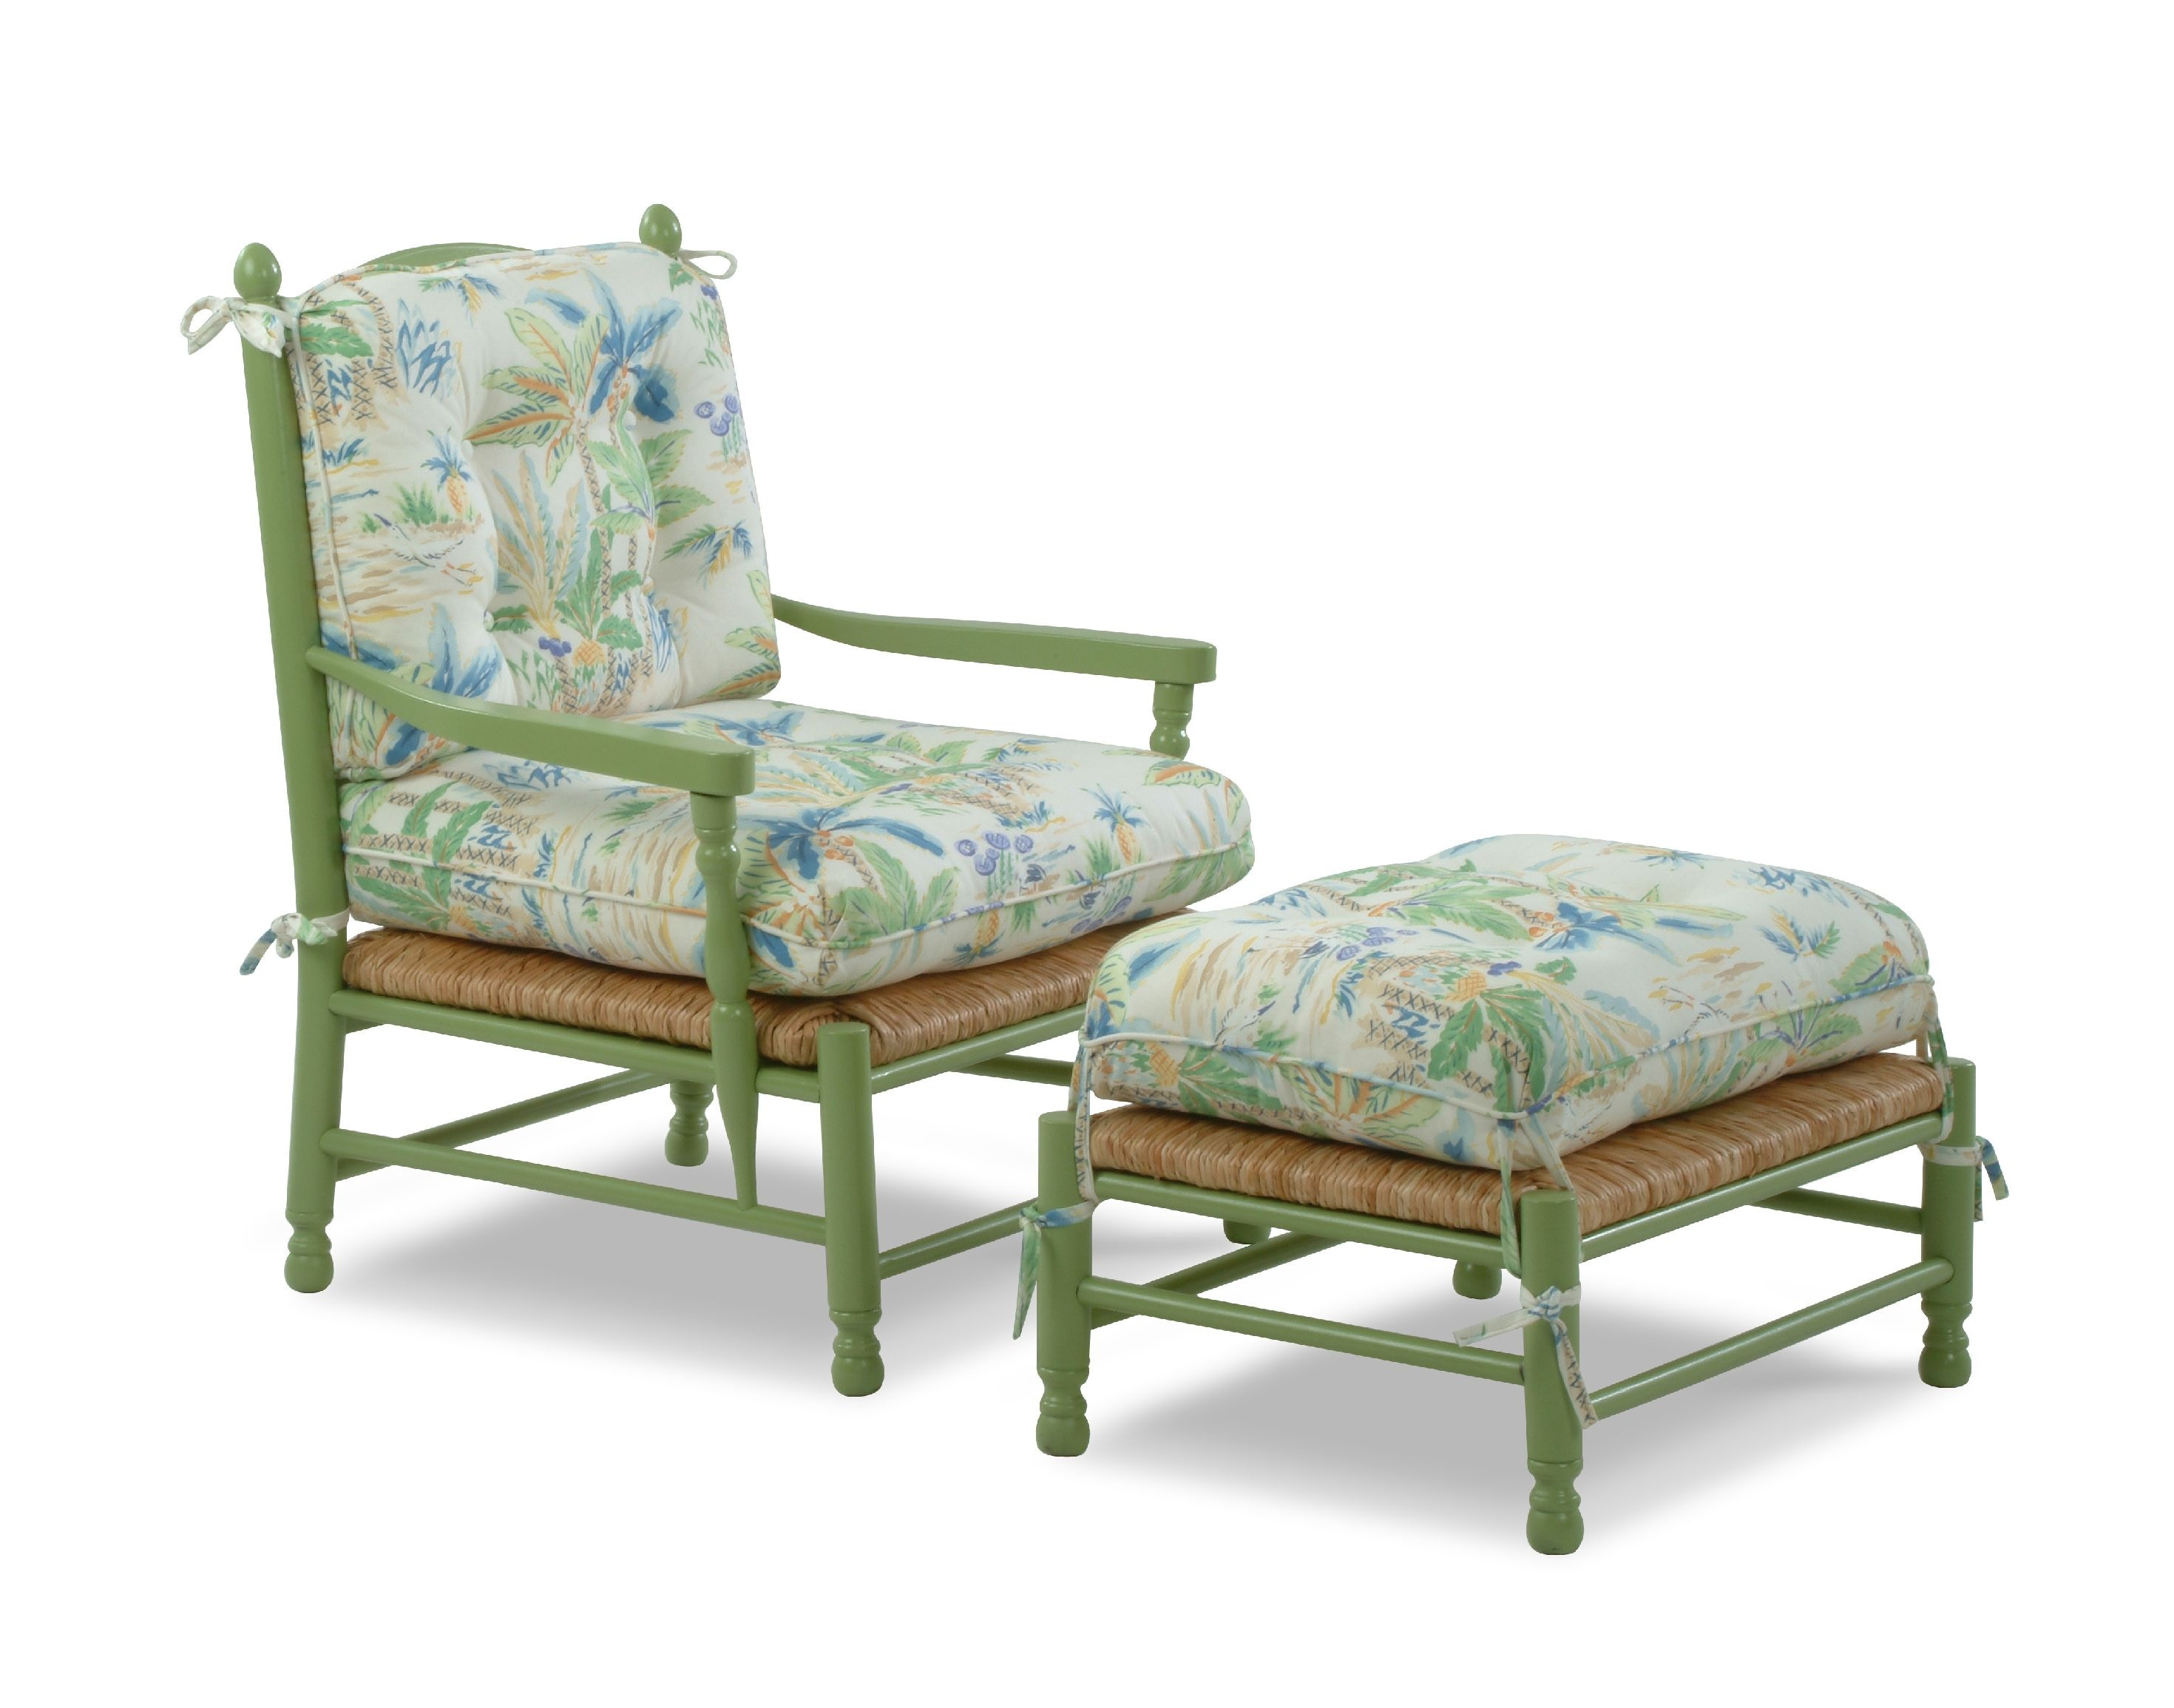 Vineyard Chair 1204-001